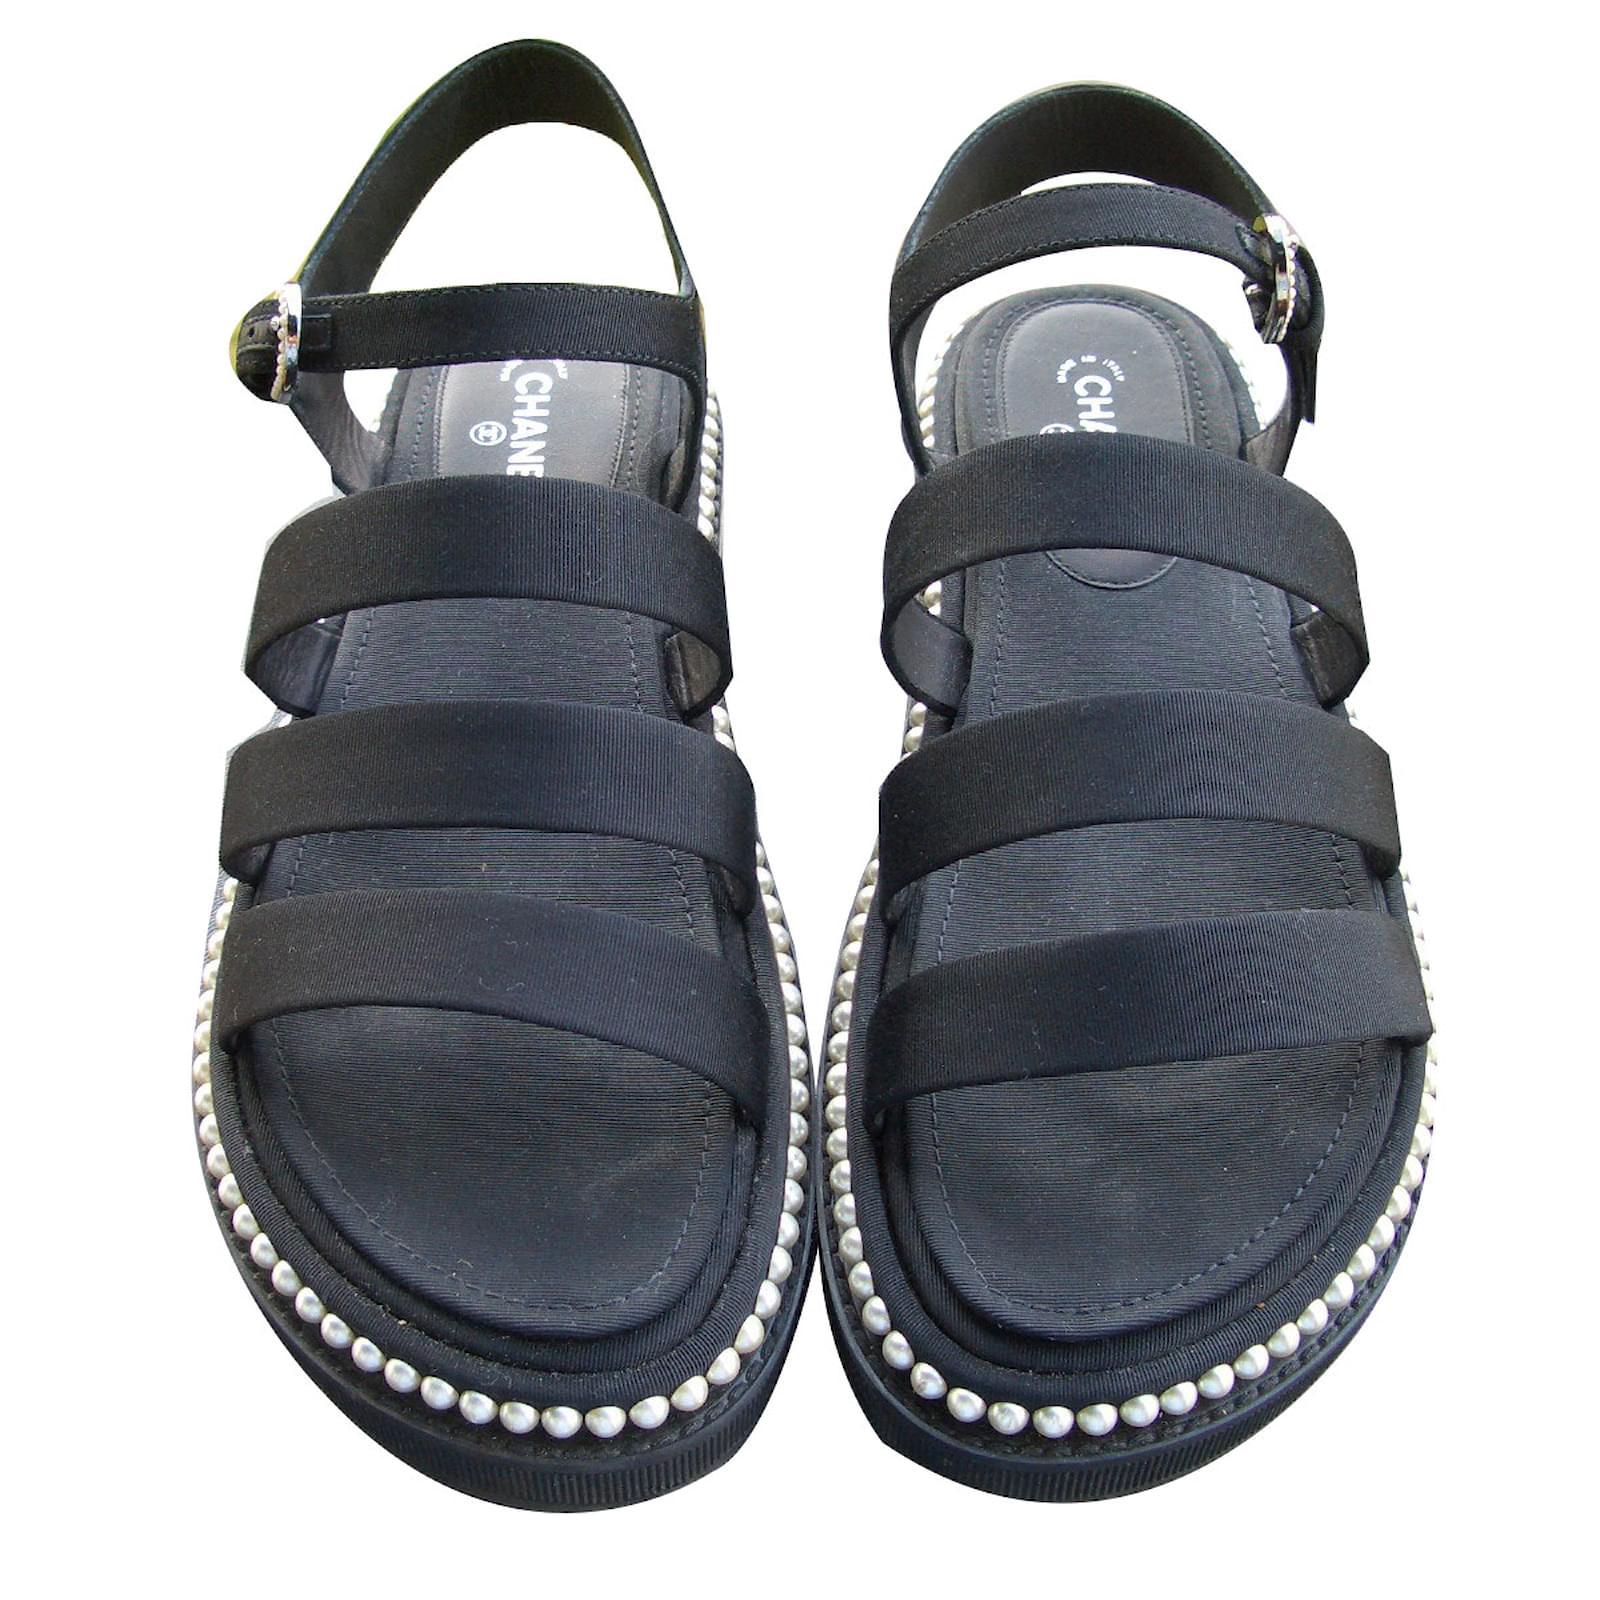 9e3428c4c74 Chanel Sandals Sandals Leather Black ref.61194 - Joli Closet